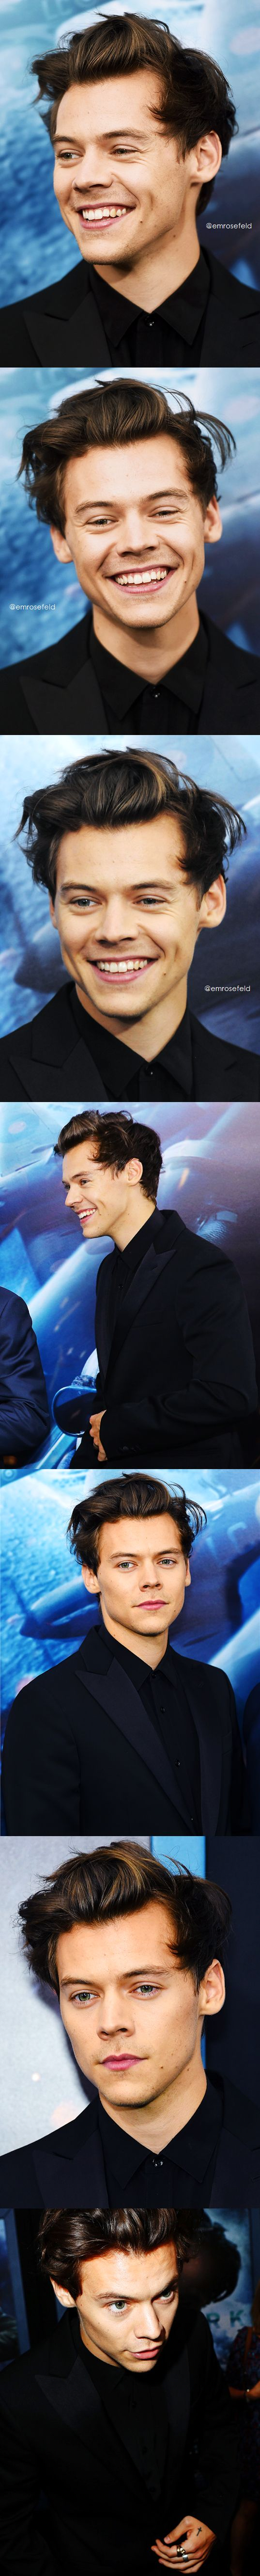 Harry Styles | Dunkirk premiere NY 7.18.17 | emrosefeld |